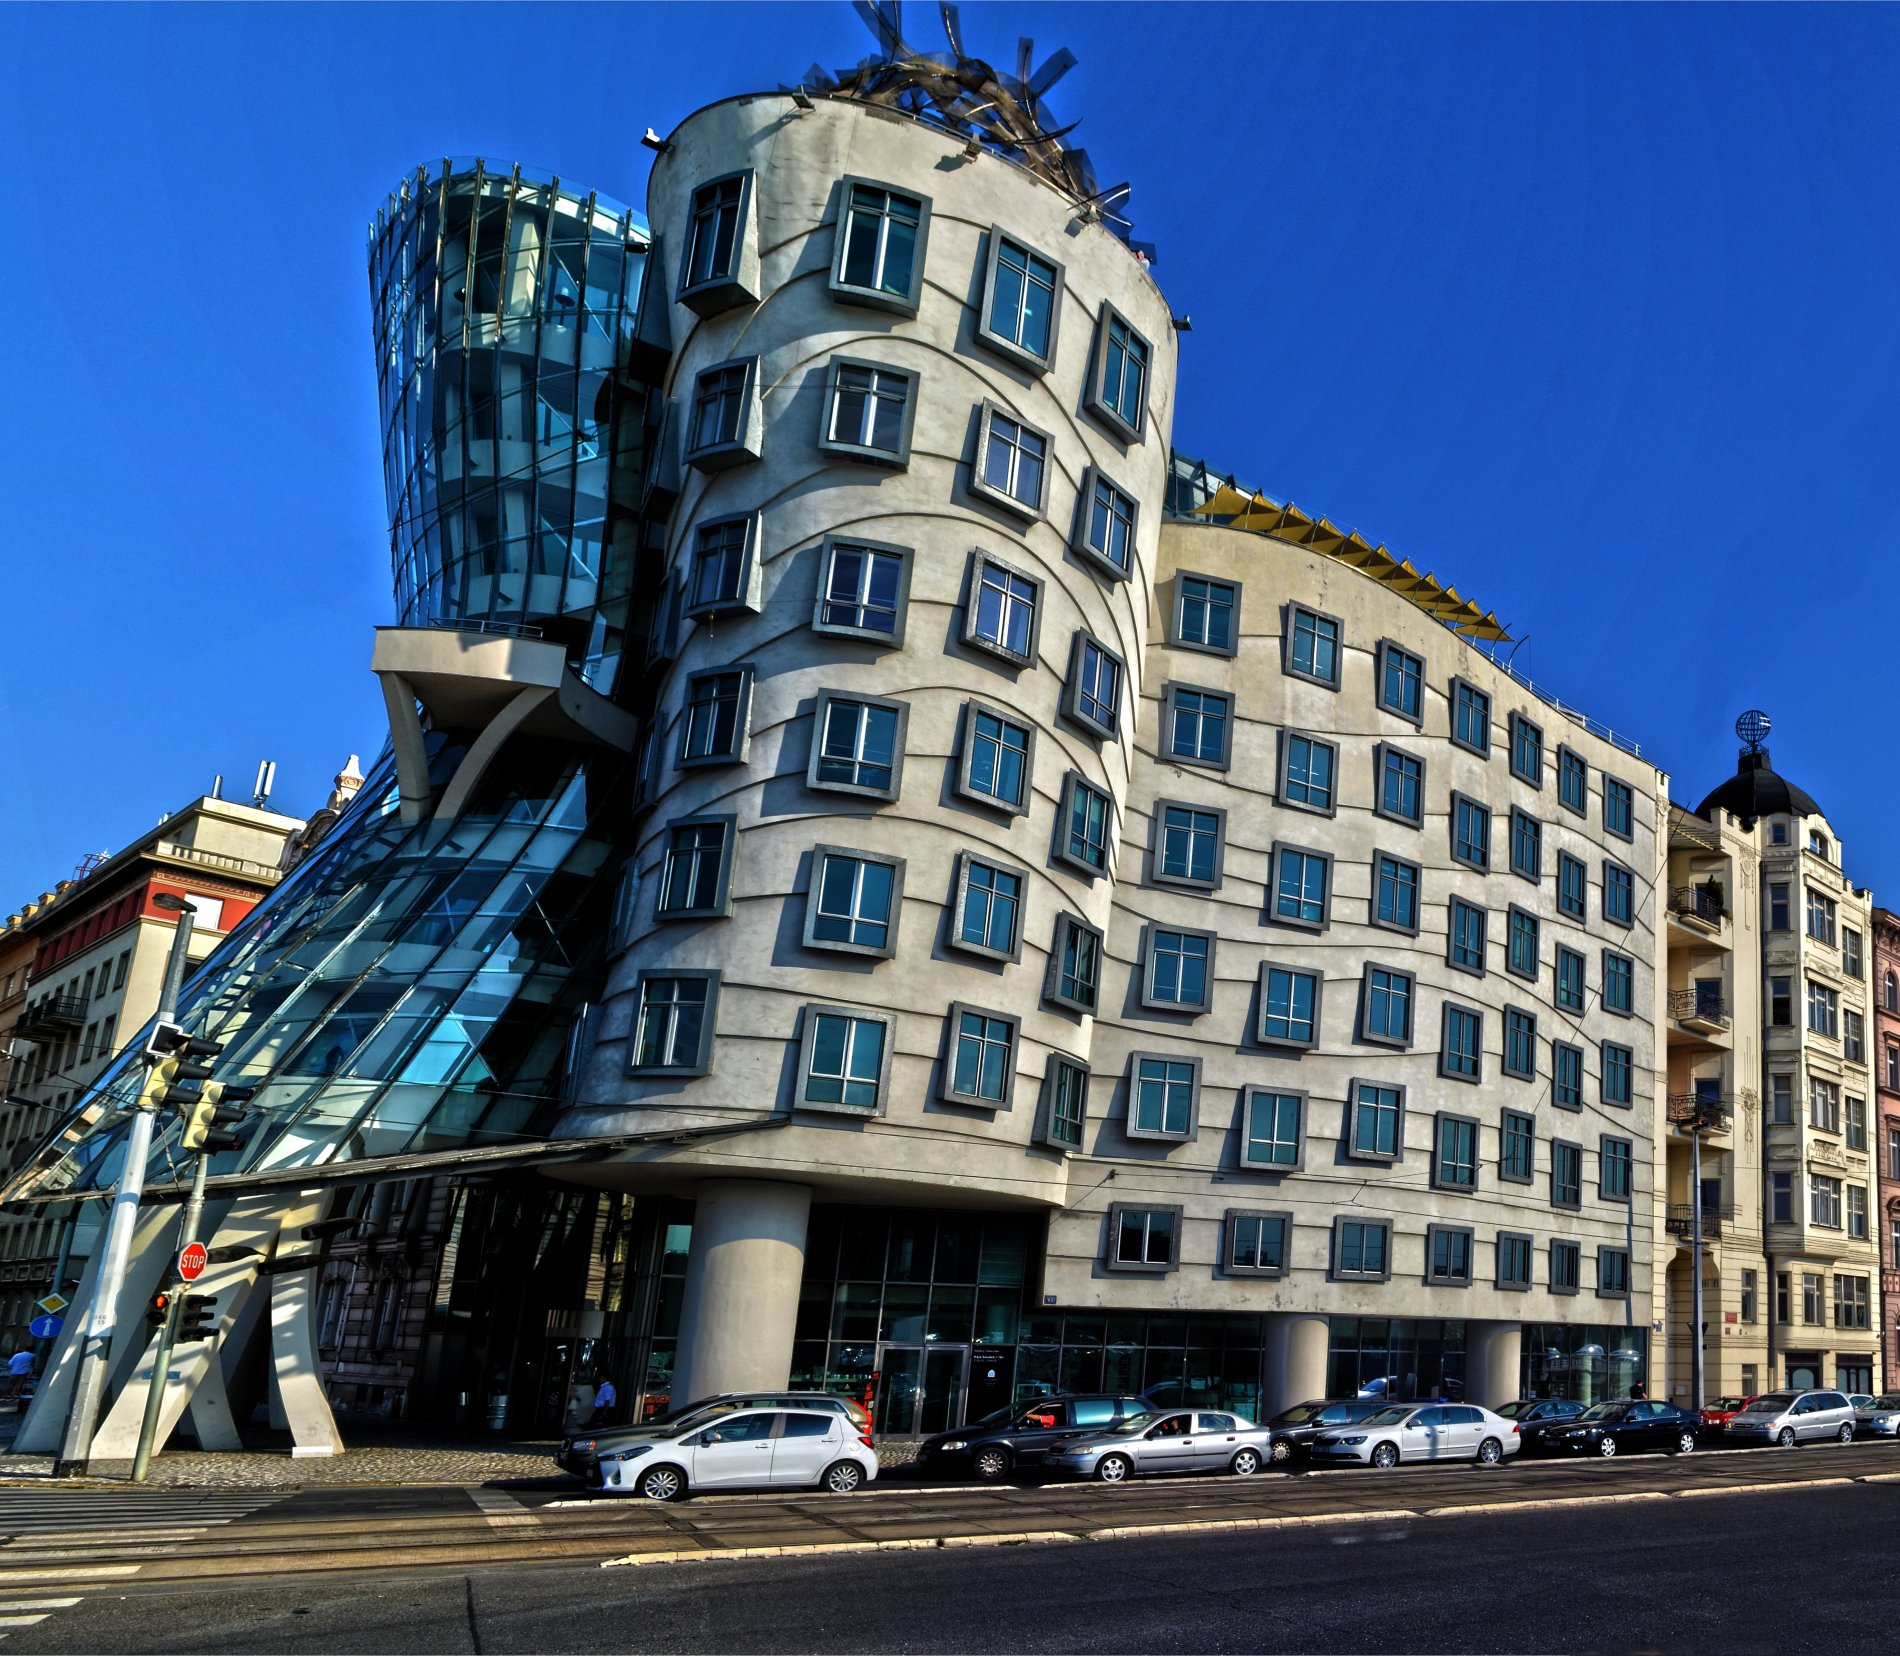 Architekt-Tour